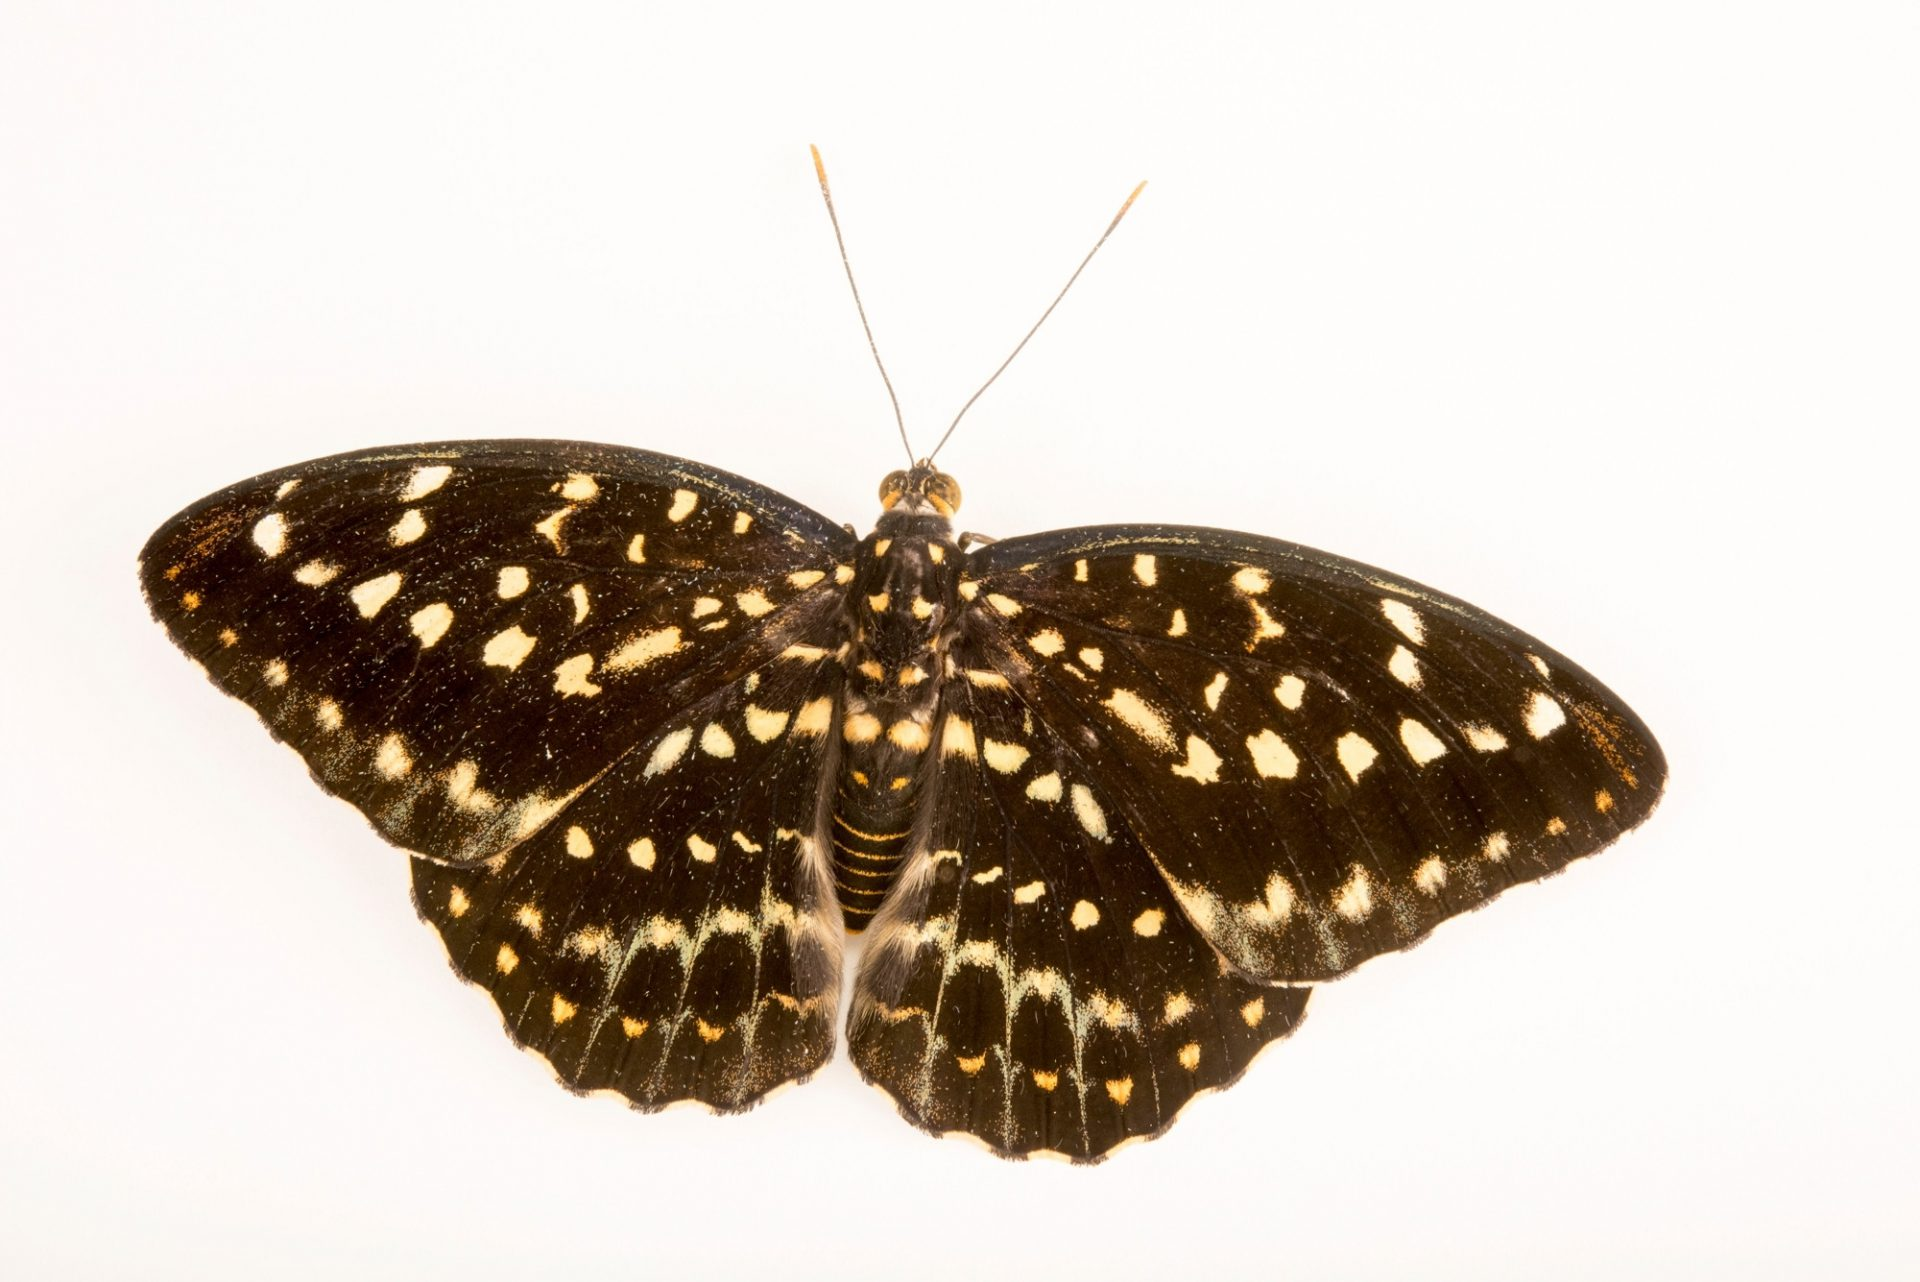 Photo: A female archduke (Lexias pardalis dirteana) at Malacca Butterfly and Reptile Sanctuary.